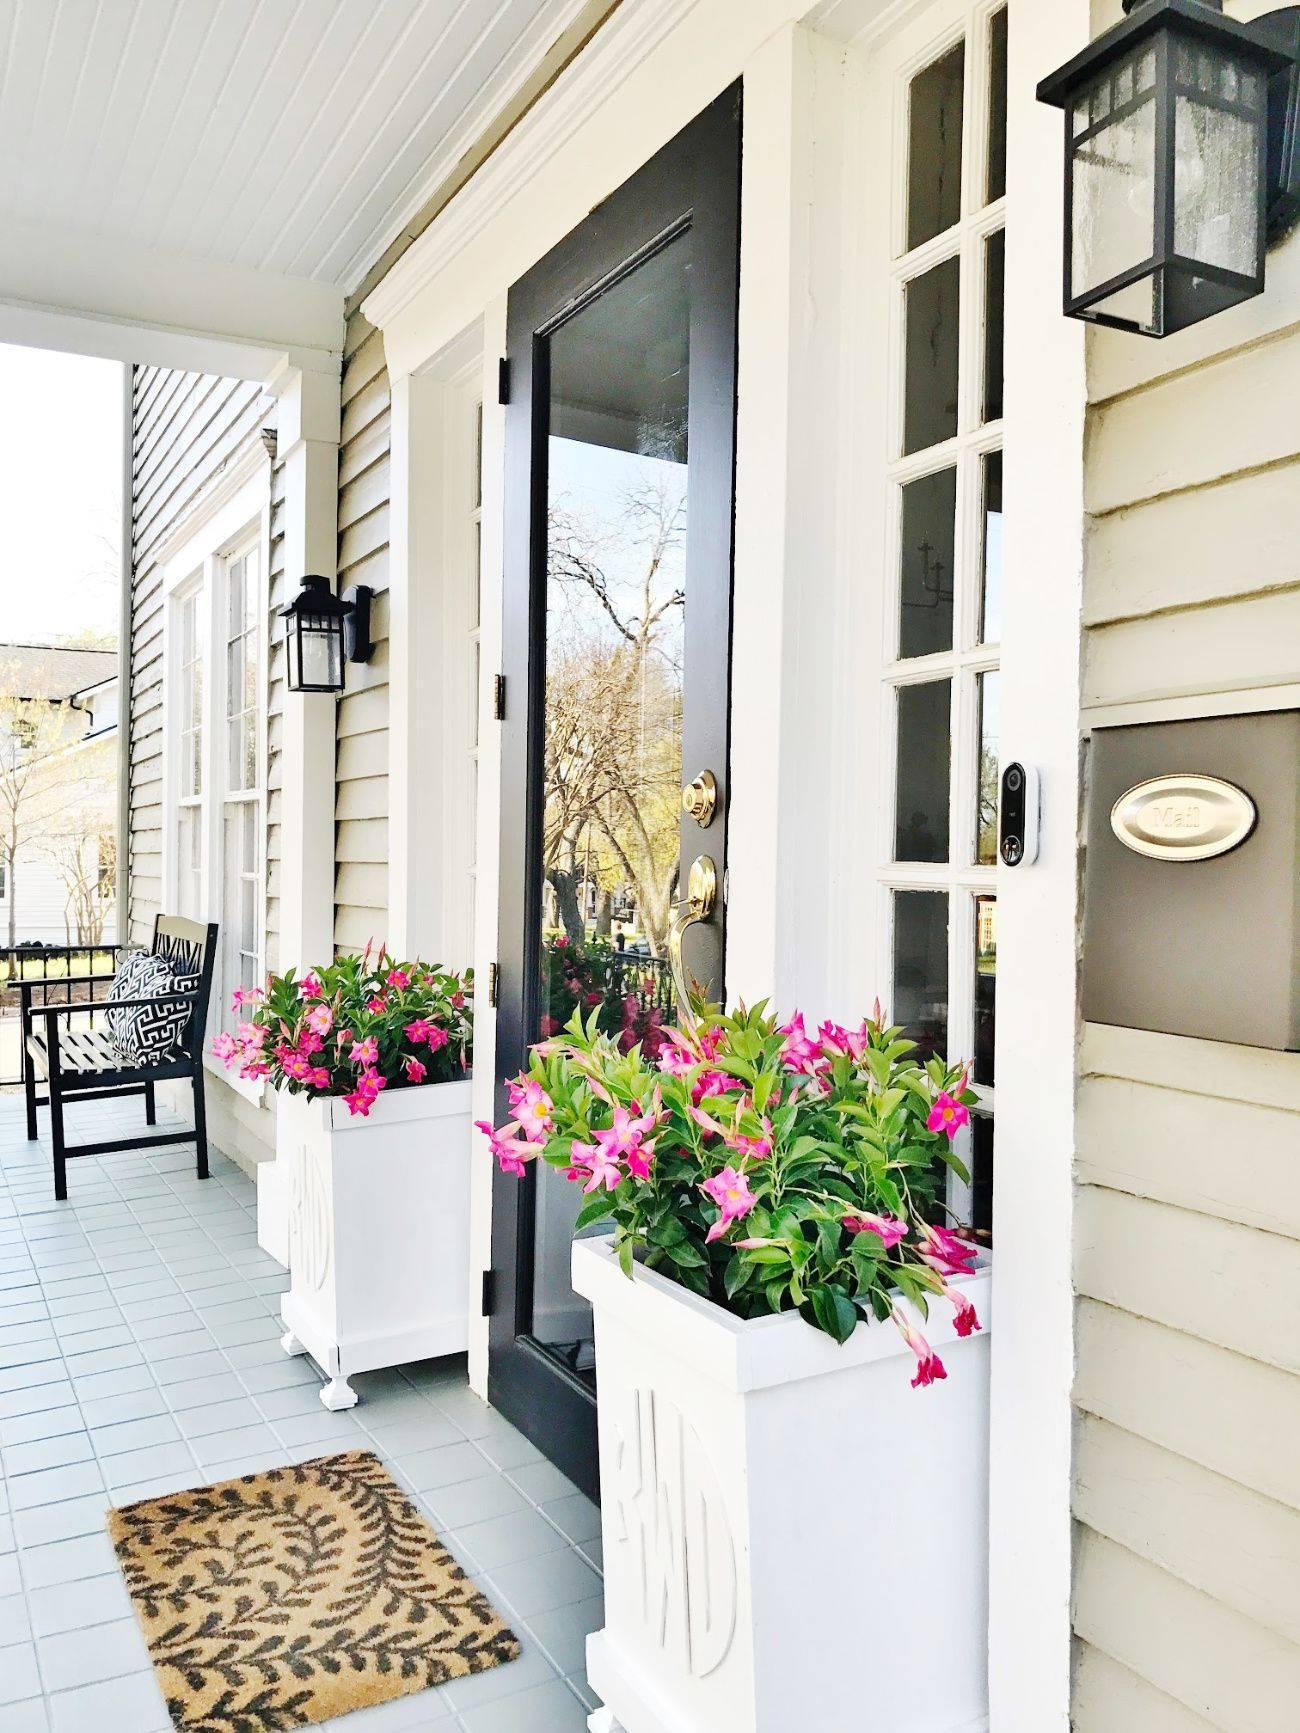 Stunning Front Door Flower Pots [11 Fabulous Ideas]